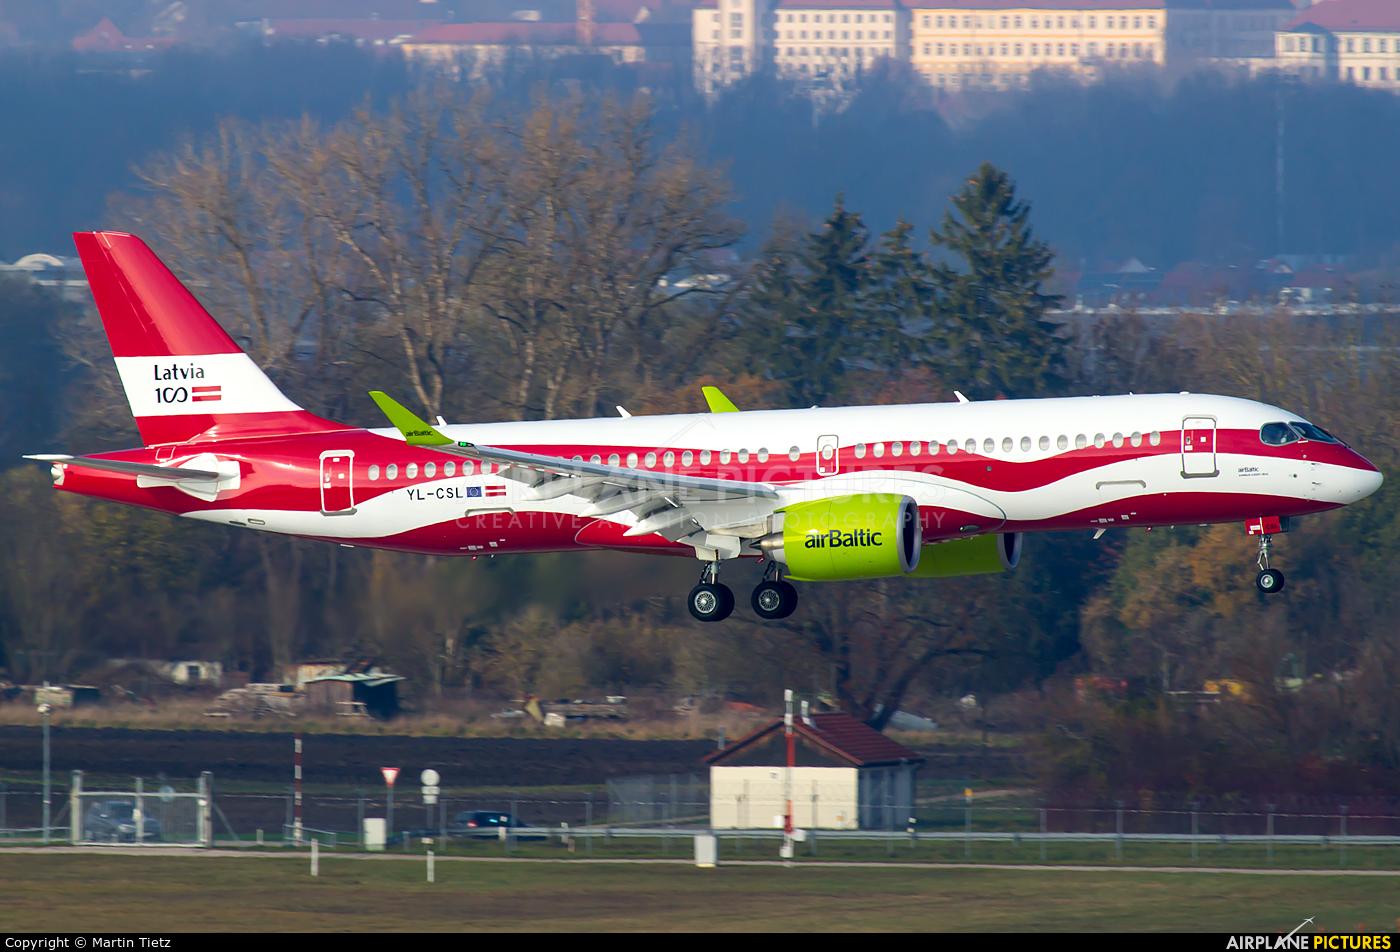 Air Baltic YL-CSL aircraft at Munich